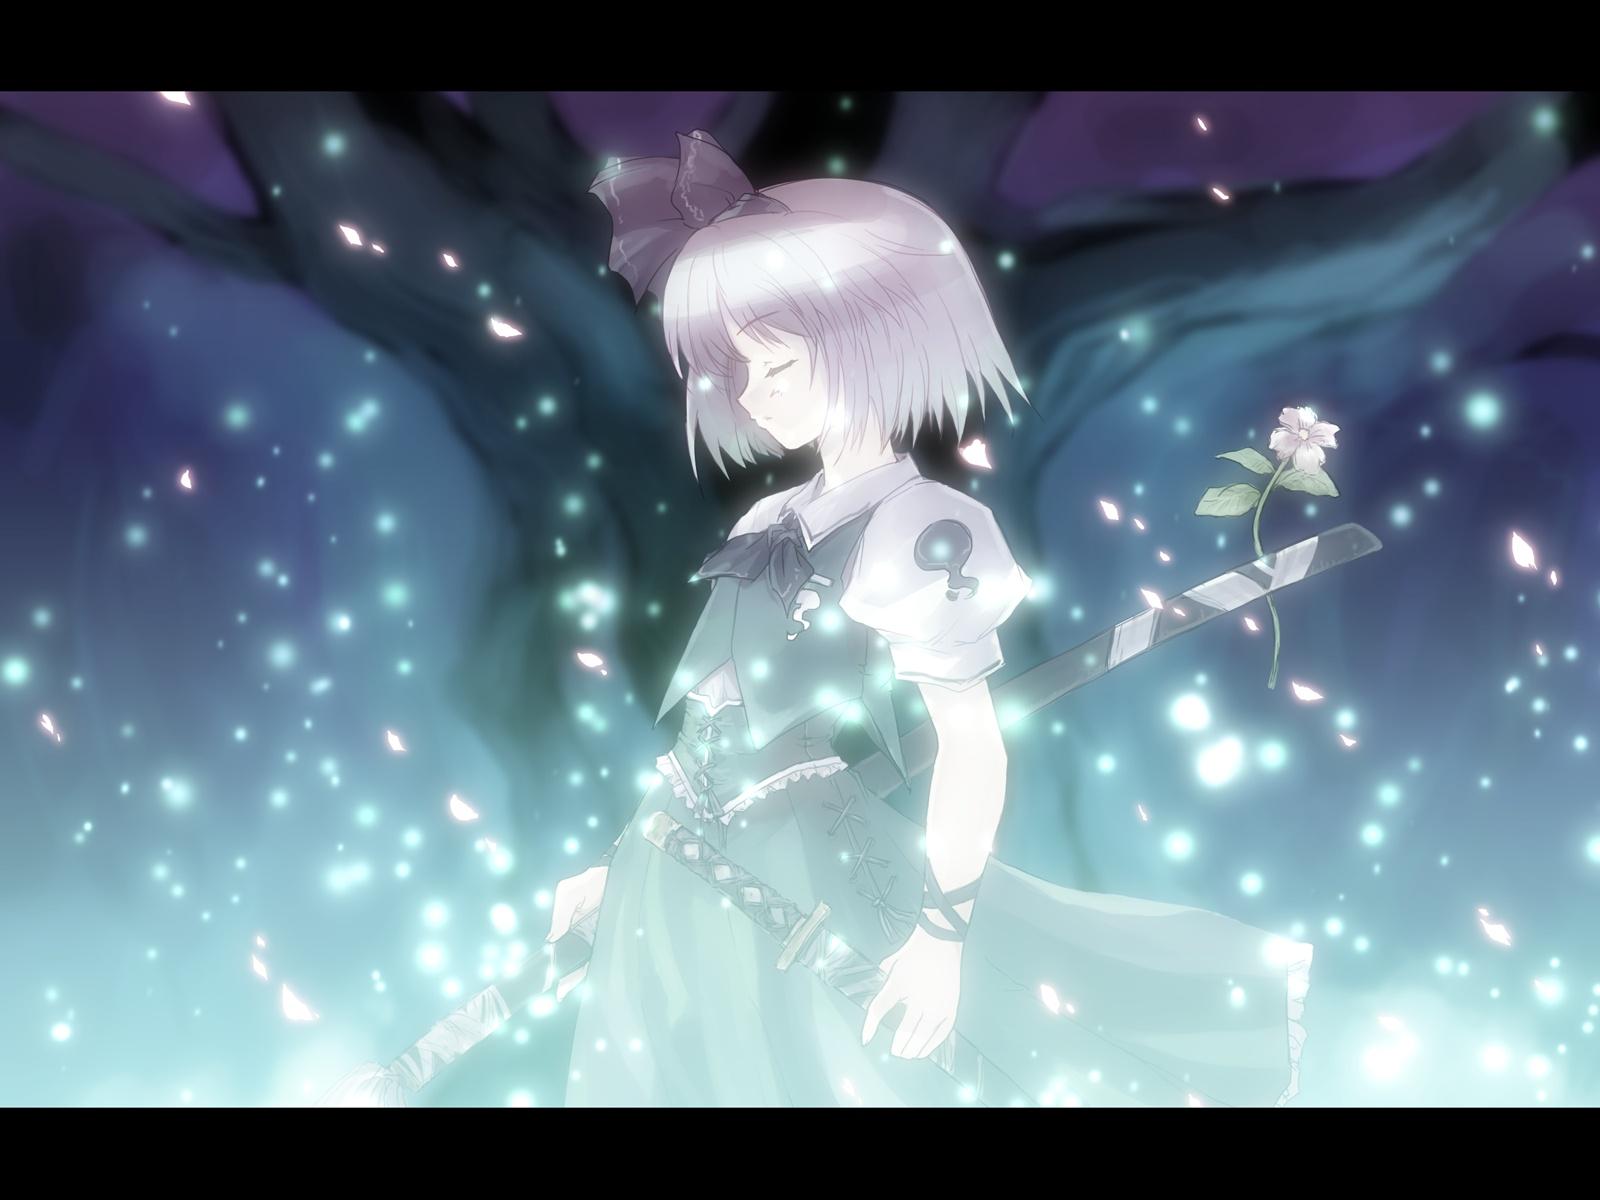 blonde_hair bow flowers katana konpaku_youmu rose sword tokiame touhou weapon